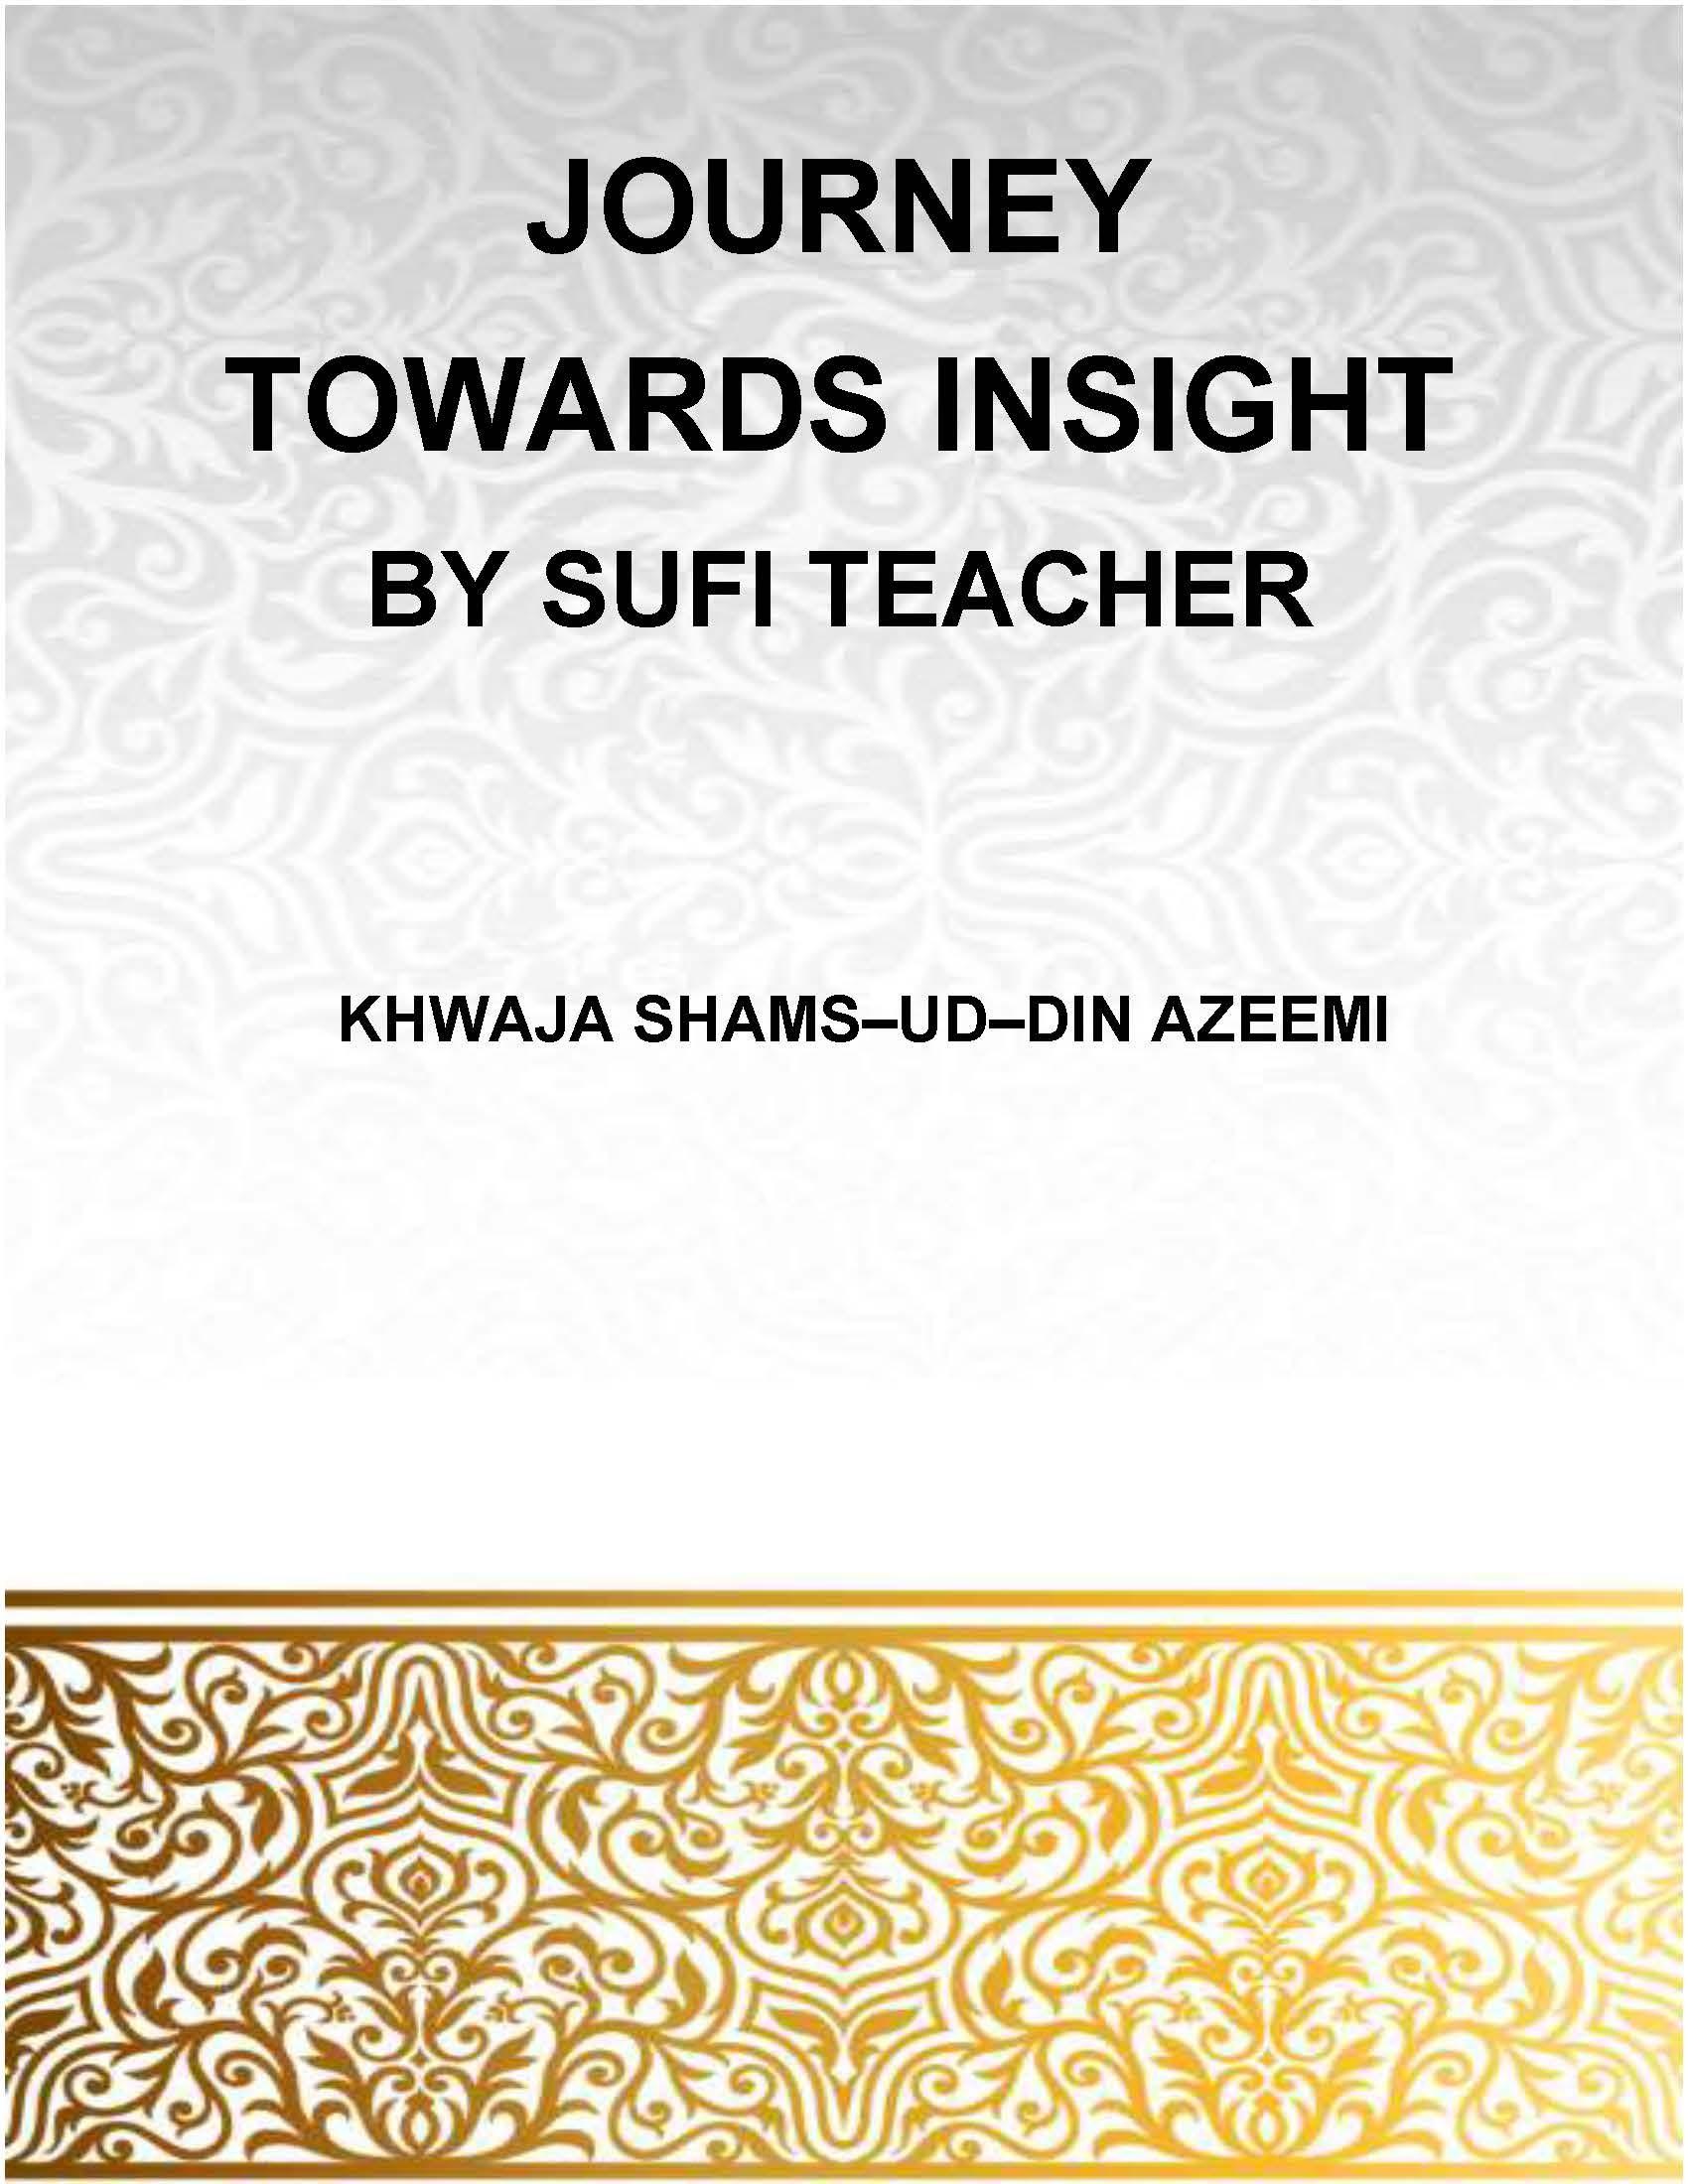 Journey Towards Insight